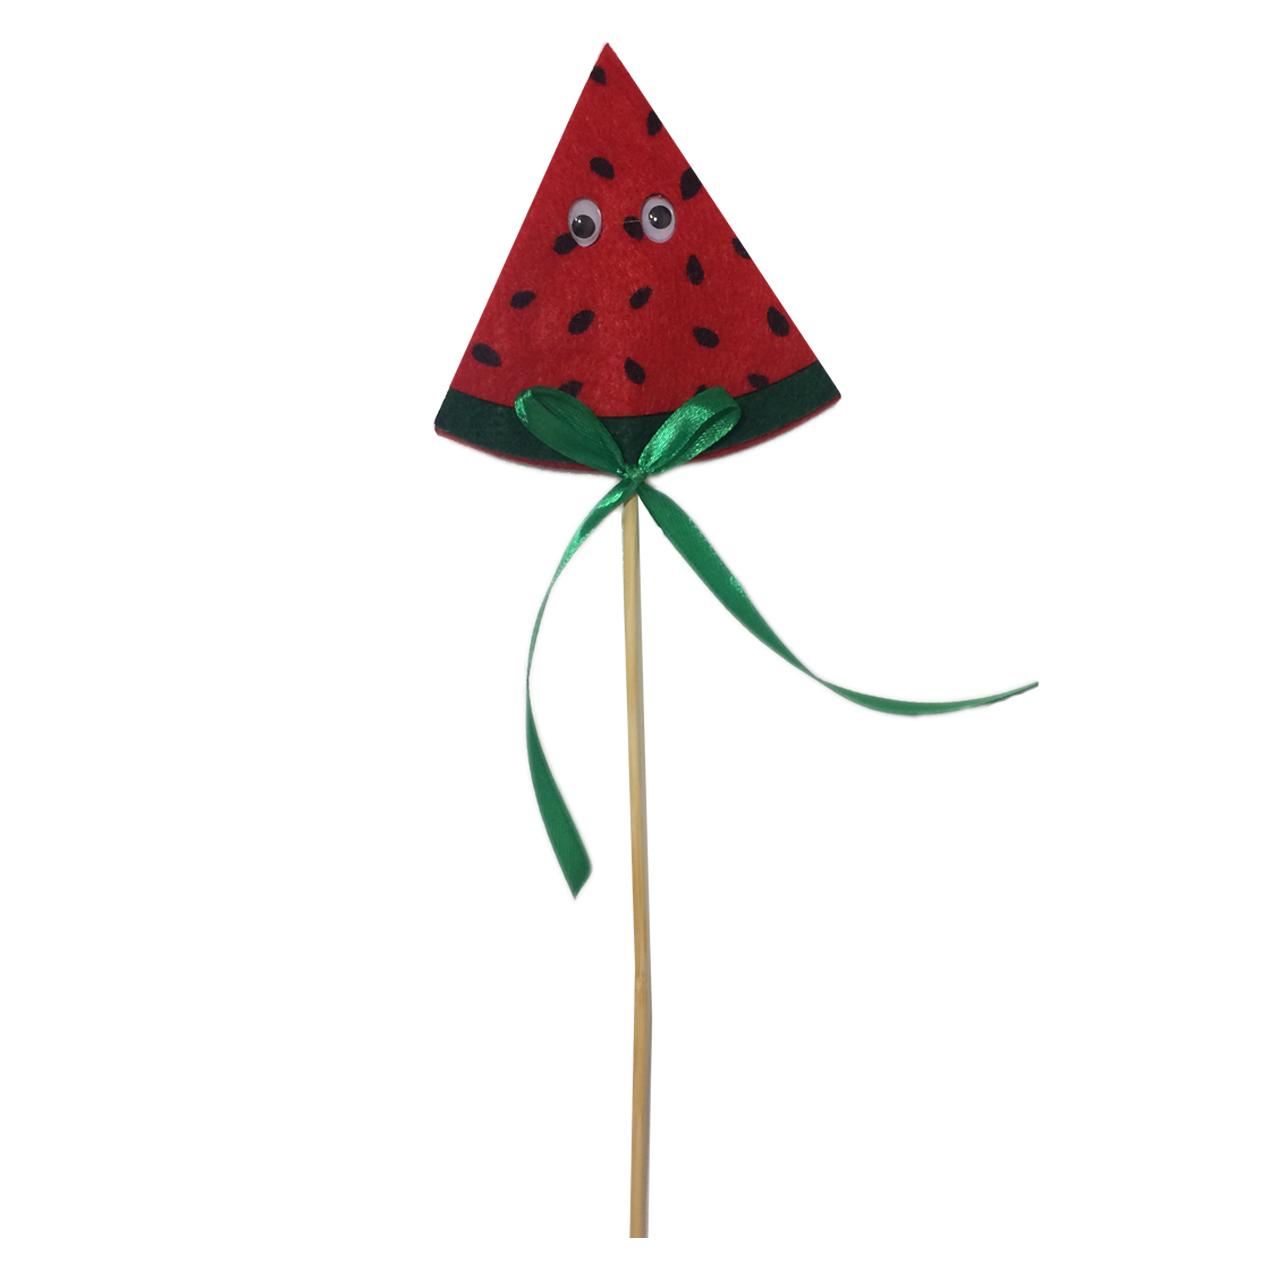 تاپر هندوانه شب یلدا مدل Yalda Watermelon02